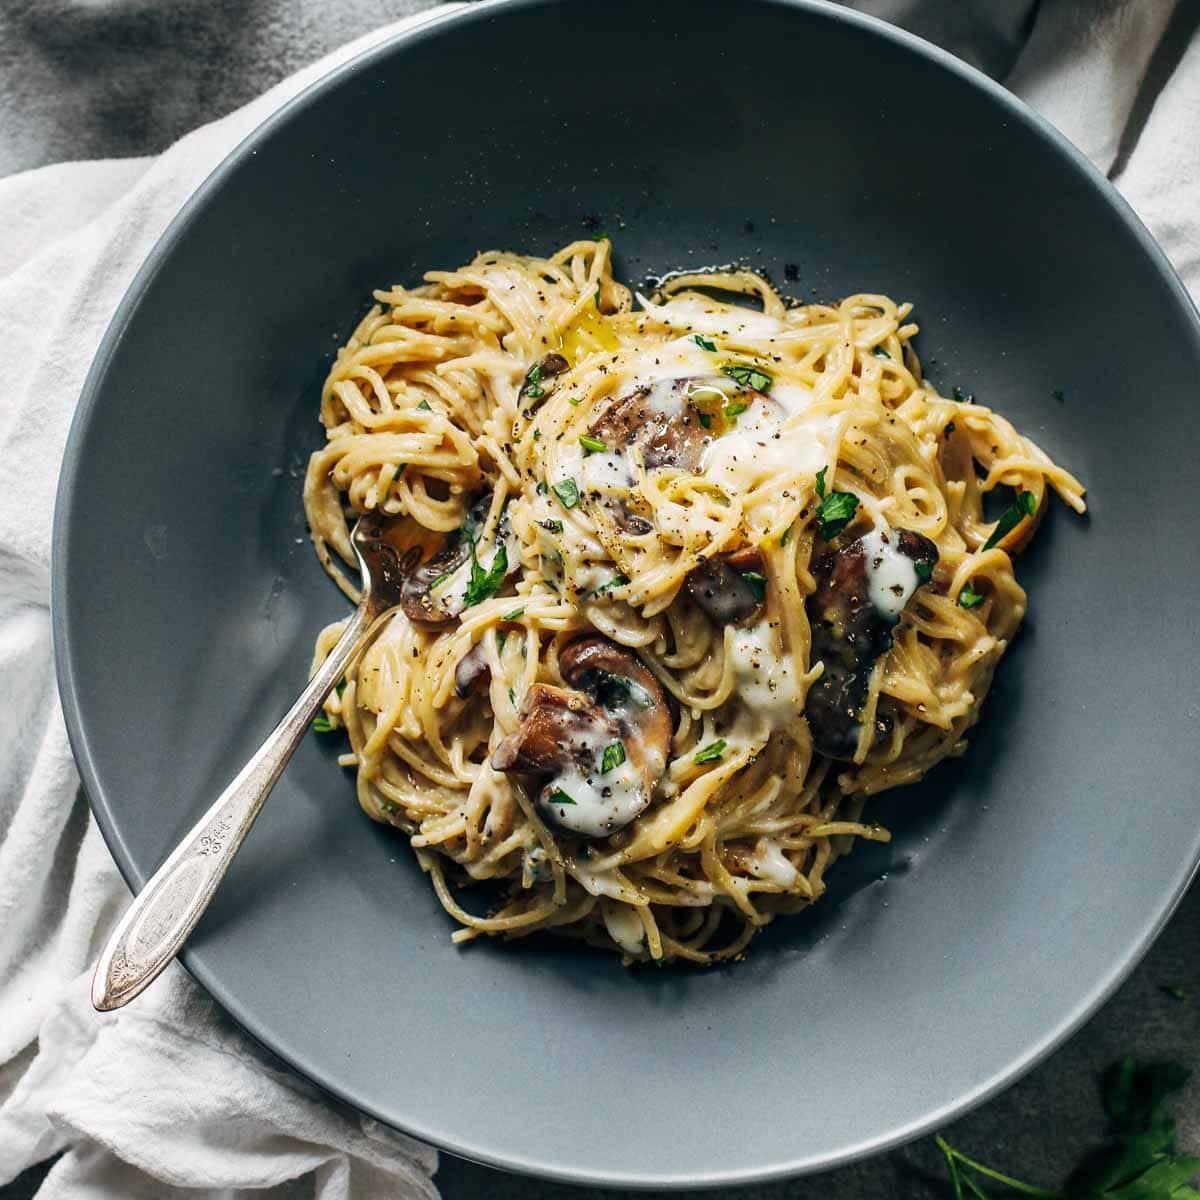 Creamy Garlic Herb Mushroom Spaghetti Recipe Pinch Of Yum